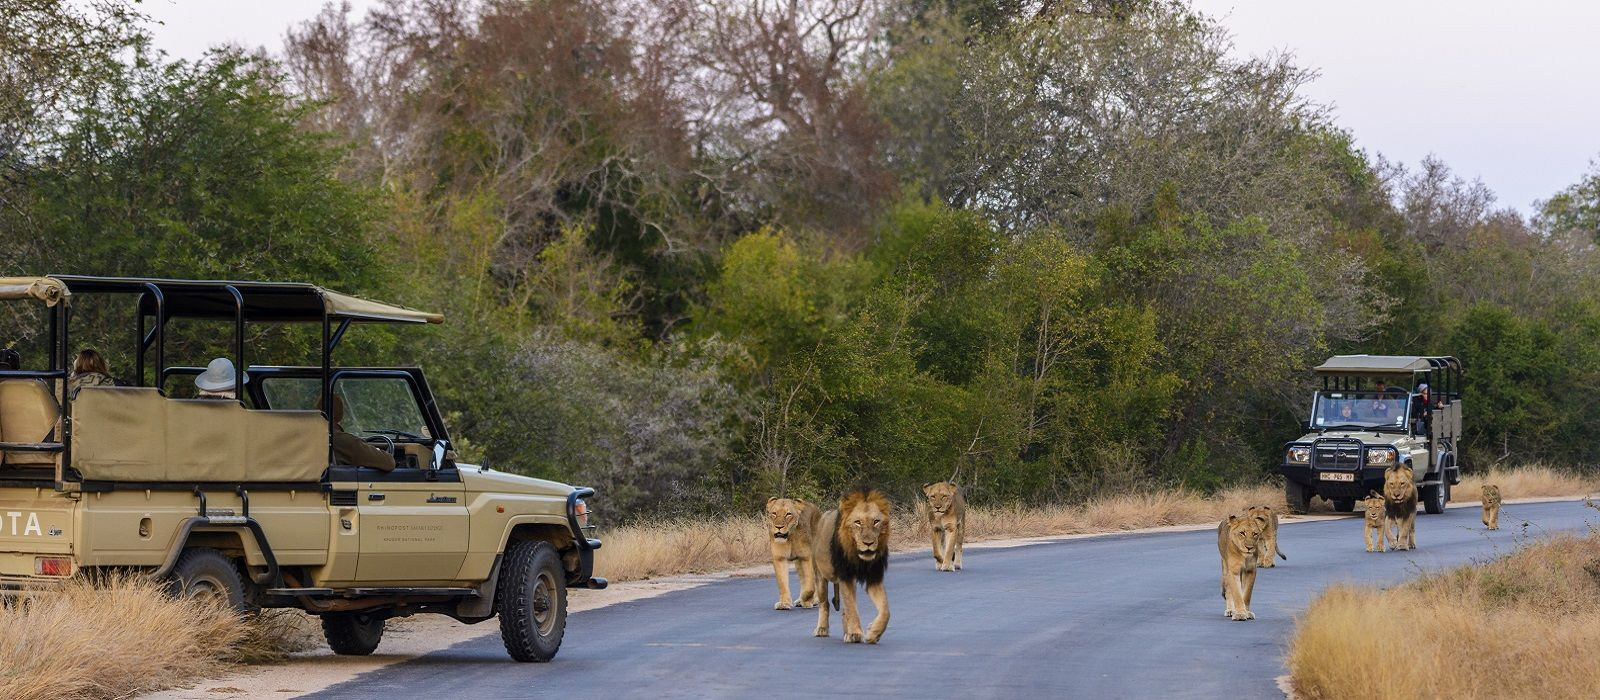 South Africa, Zimbabwe and Botswana: Wildlife and Waterfalls Tour Trip 3